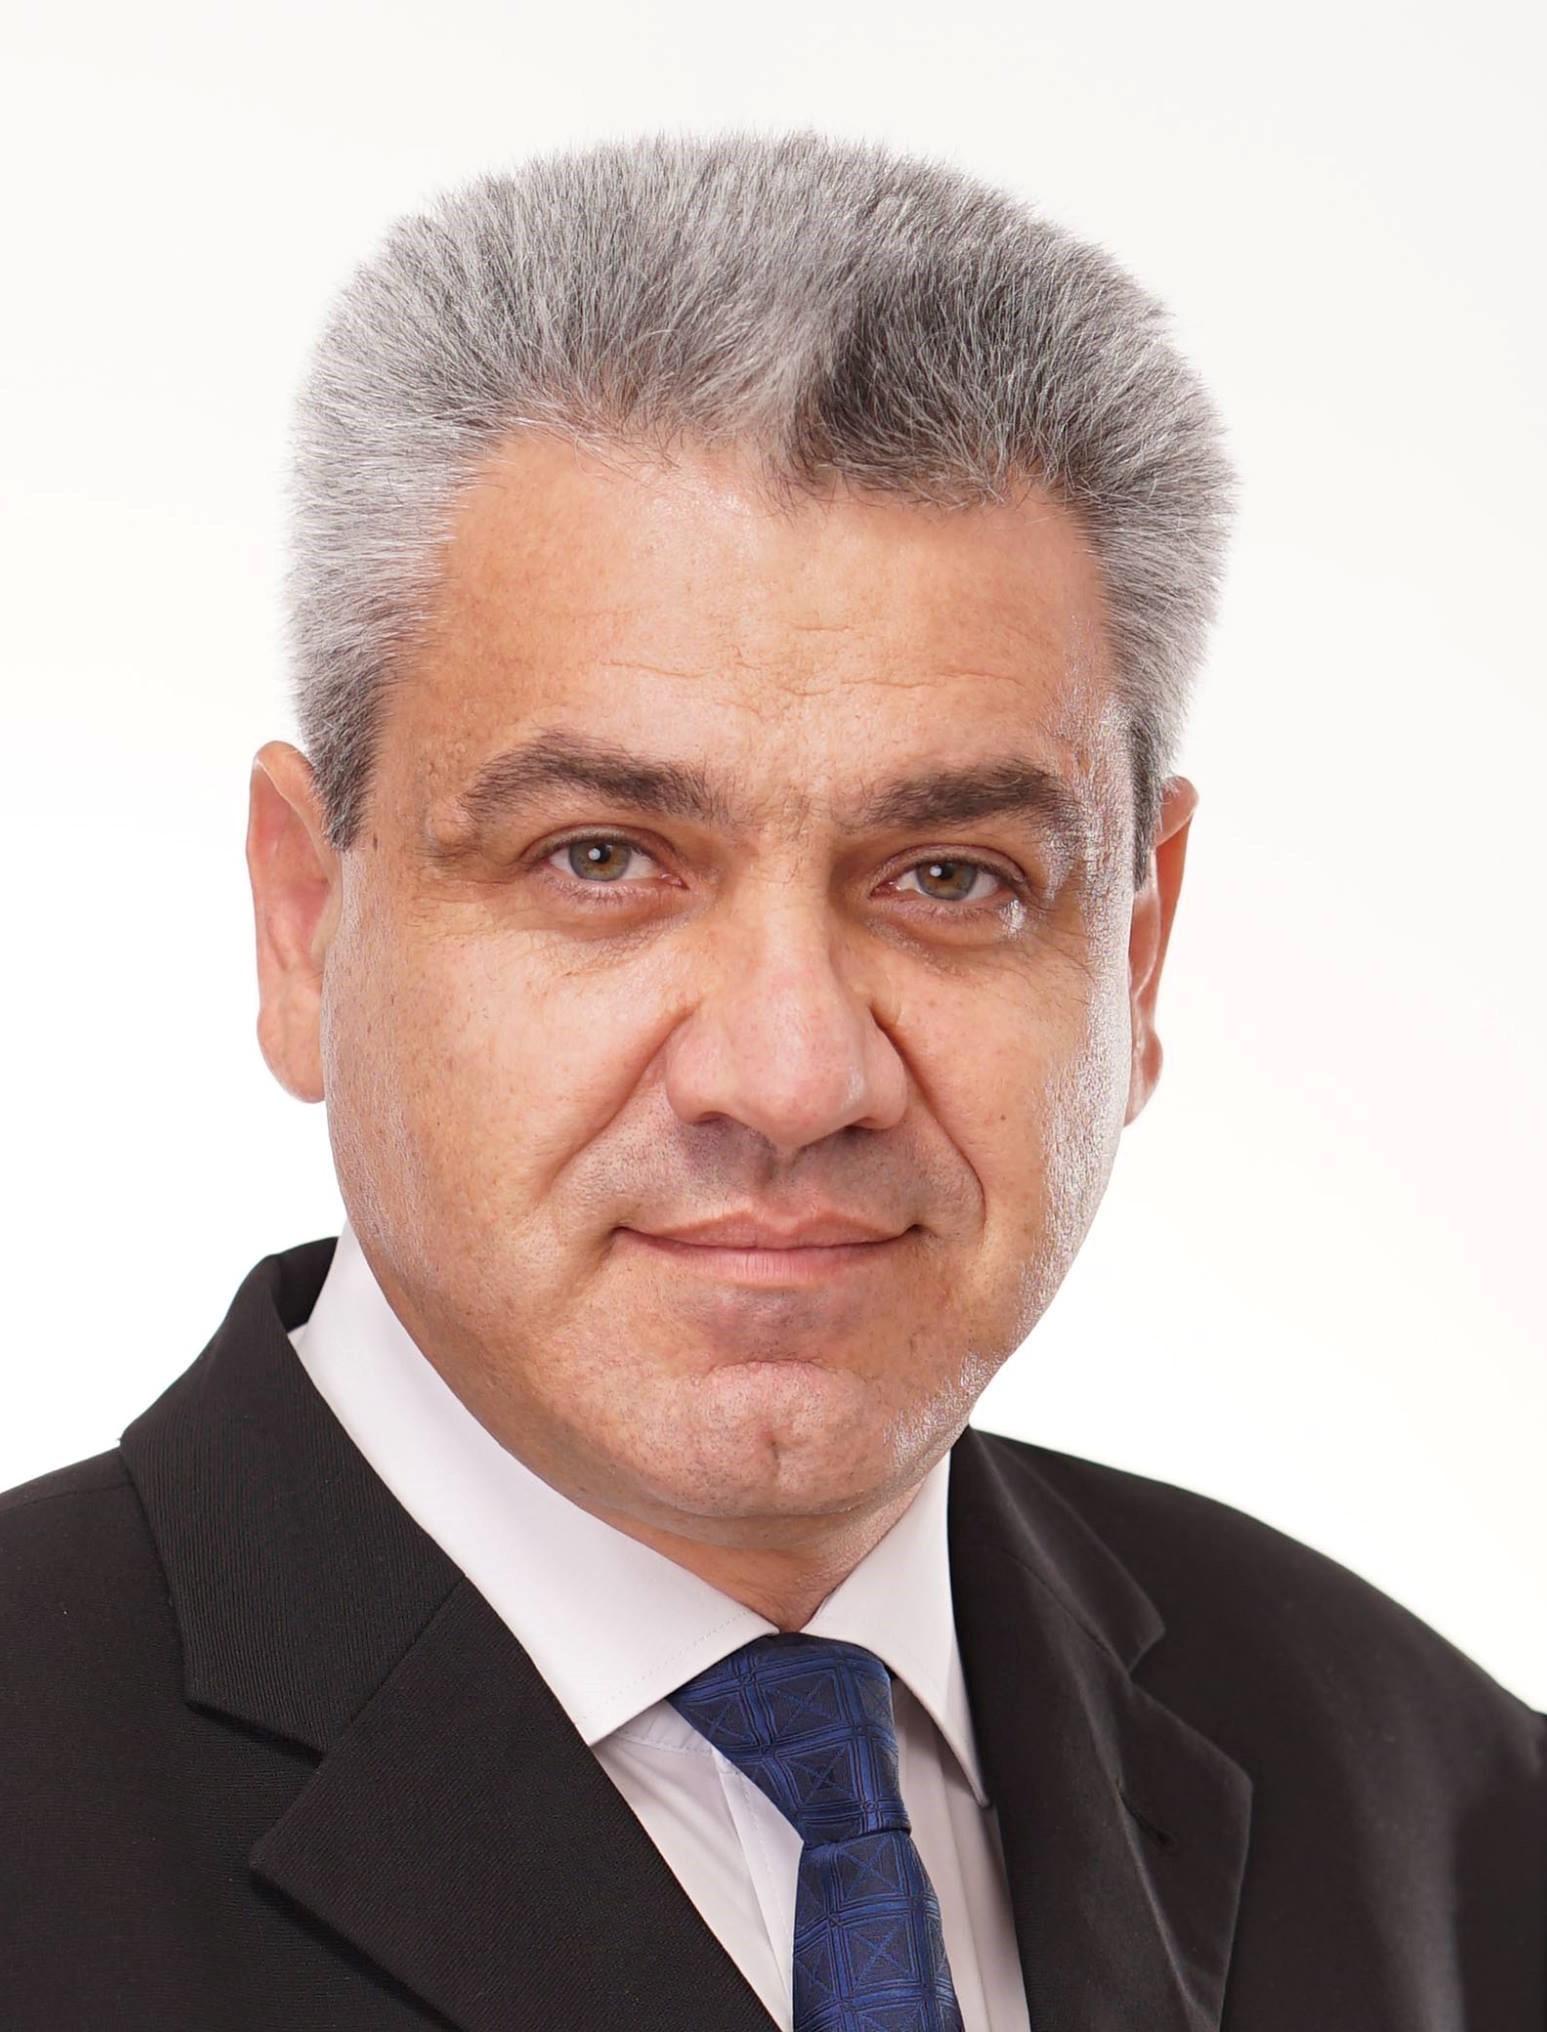 Vasile Cristian Achiței